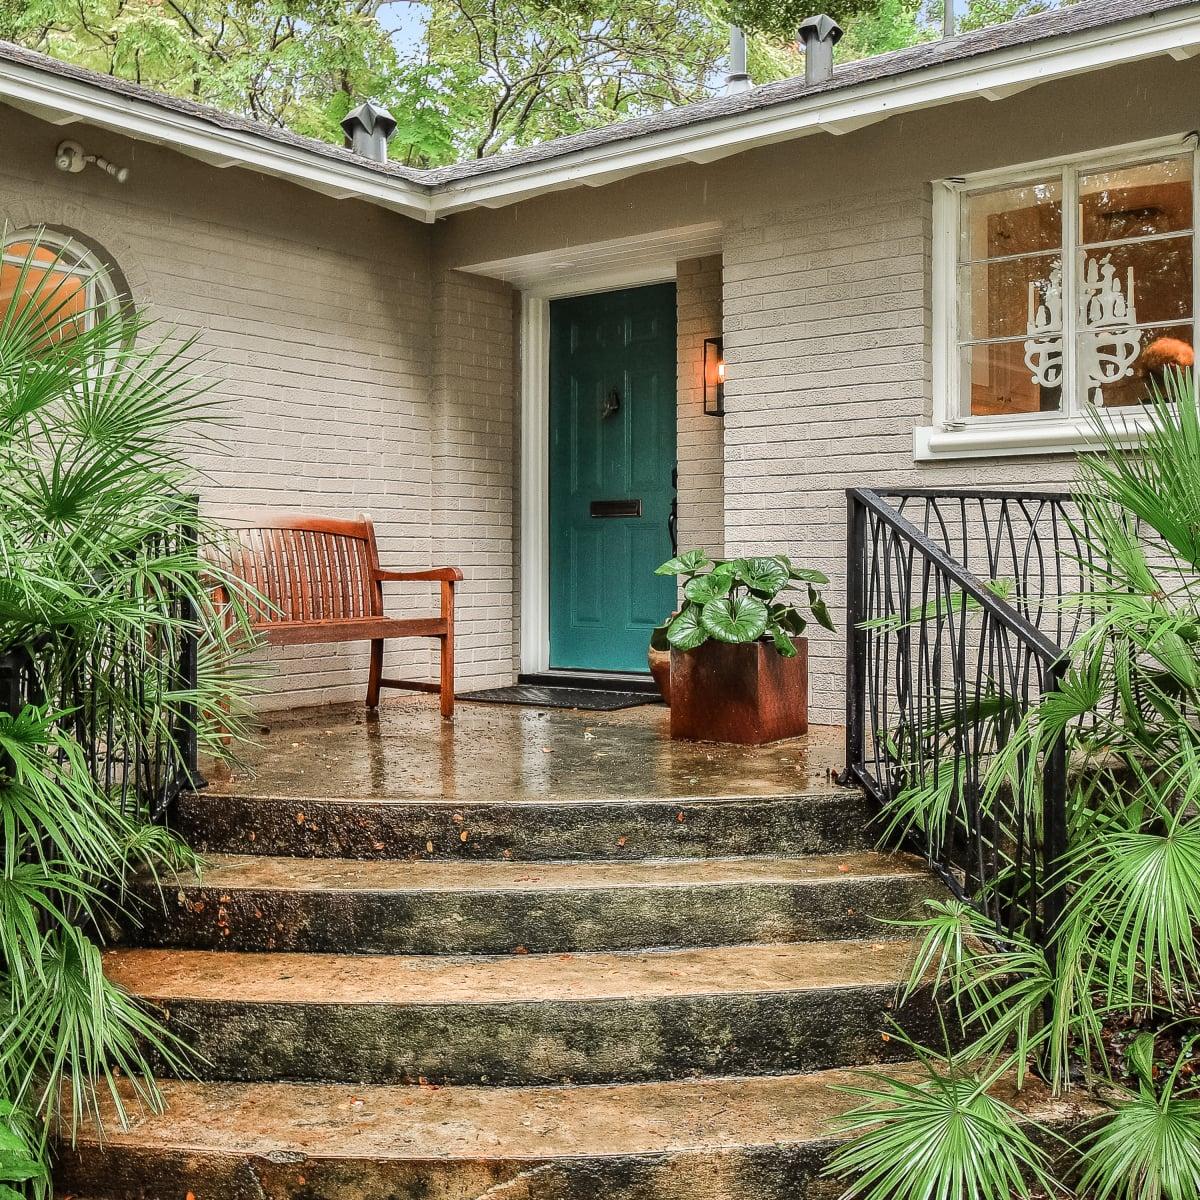 San Antonio house_802 Tuxedo